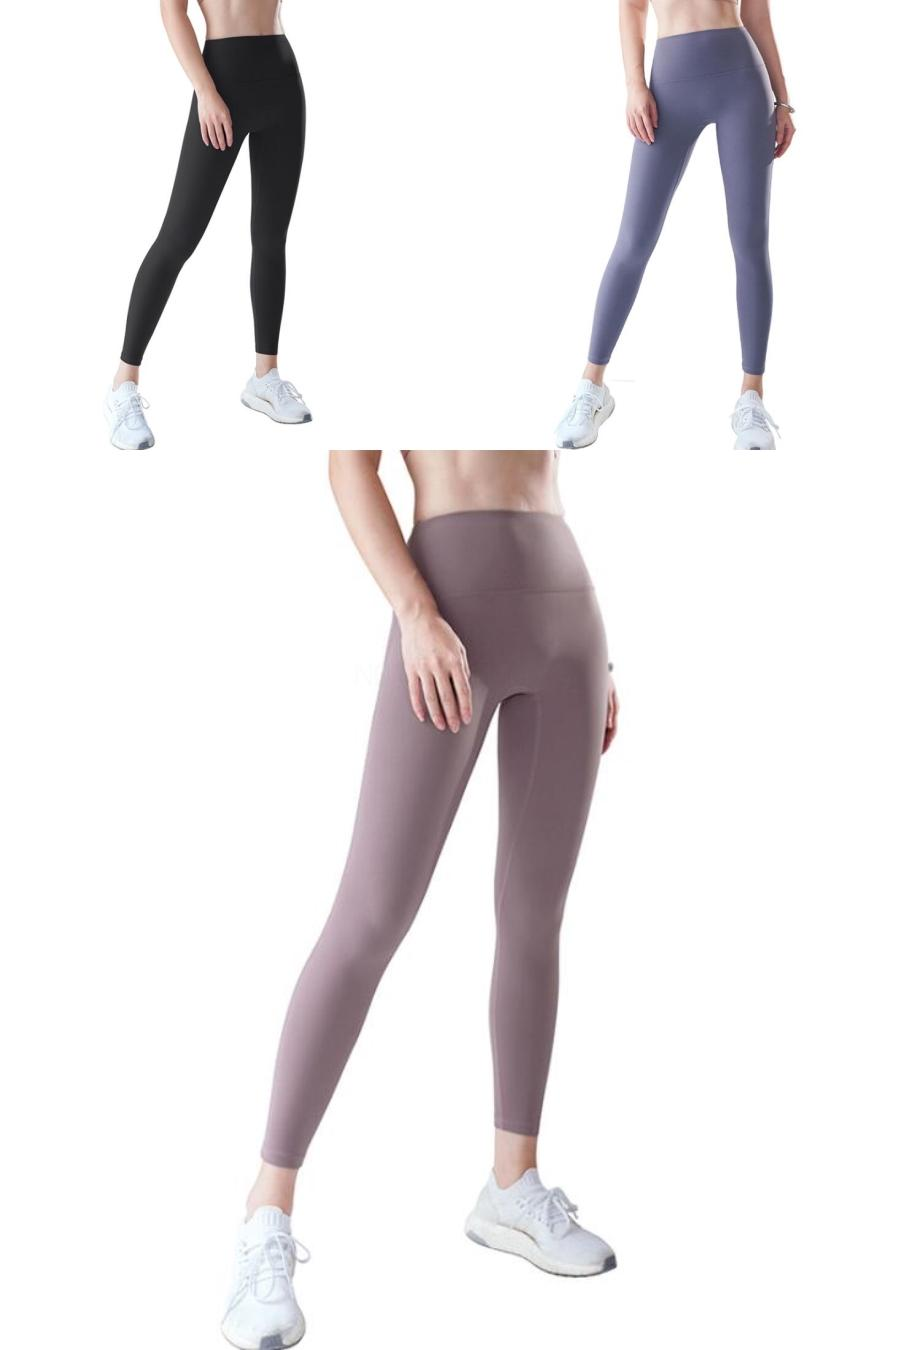 New Stretchy Ot Vendre Femme Leggings Fitness Course Pantalons Slim Femme Sexy Lady Pantalon de danse Pantalon Matière souple Yoga Legging FS5785 # 995